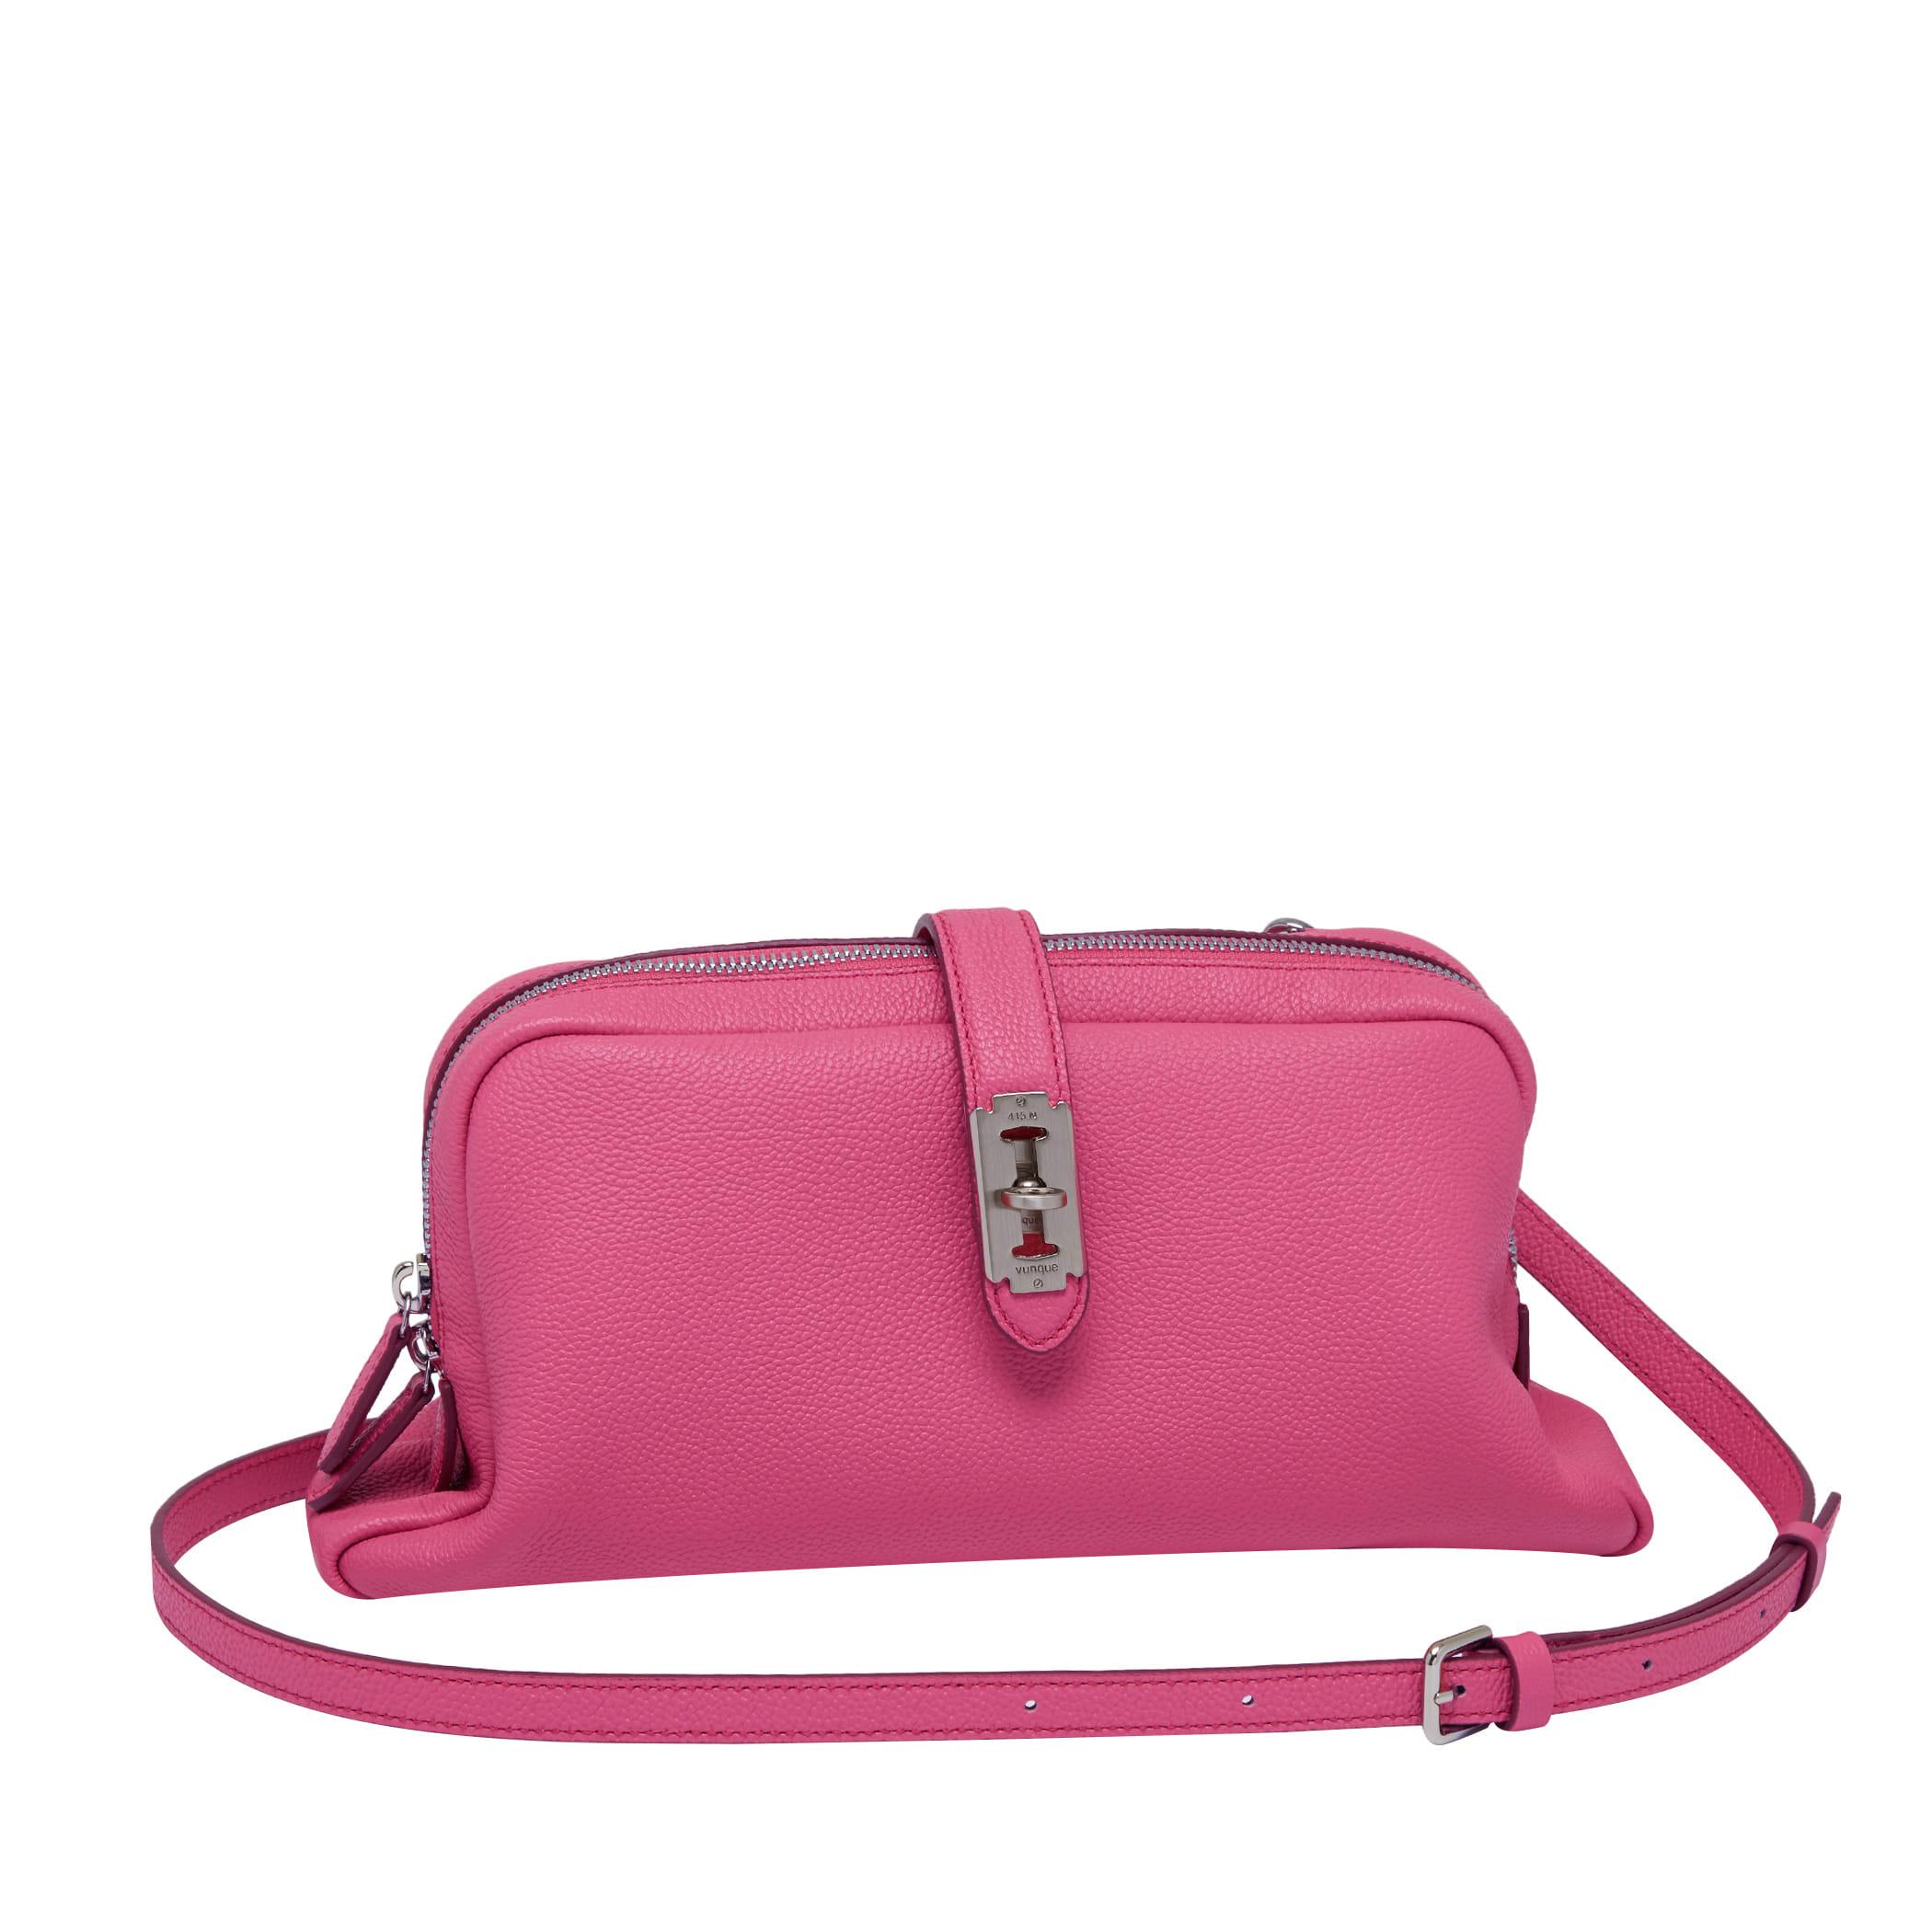 Toque Clutch (토크 클러치) Pink lux